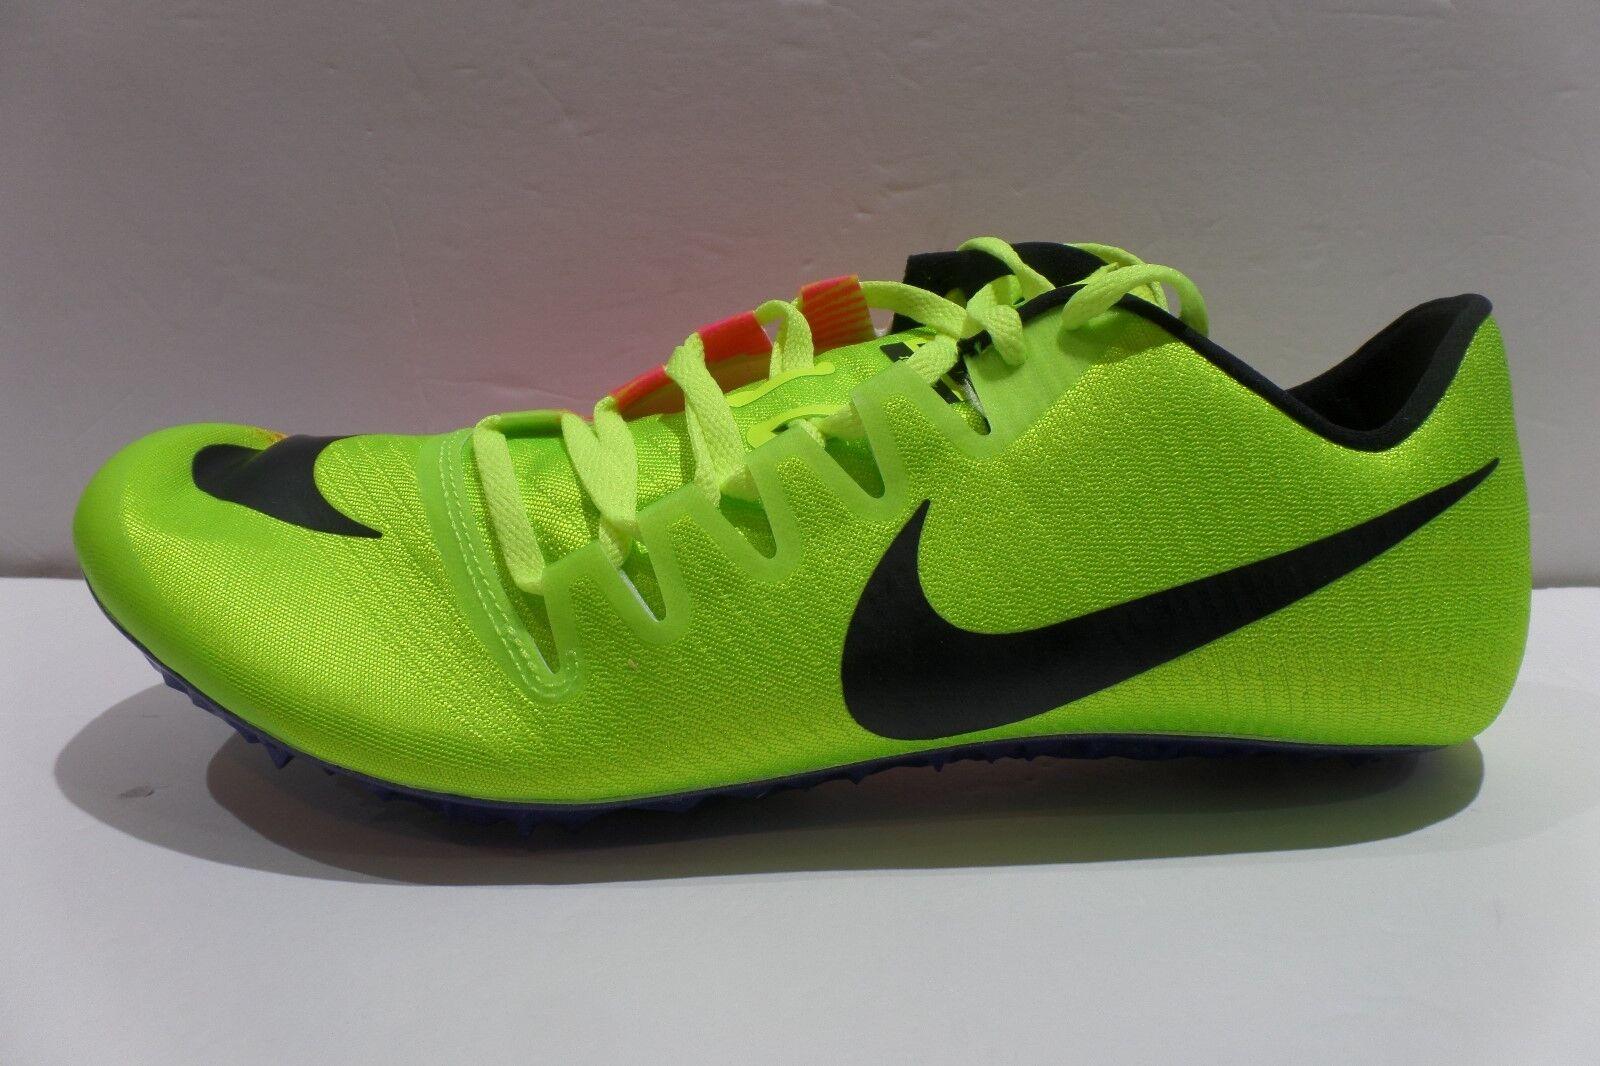 promo code c5d21 49222 ... Nike Zoom Zoom Zoom JA FLY 3 OC Rio Track   Field Spikes Men s Size 10  ...